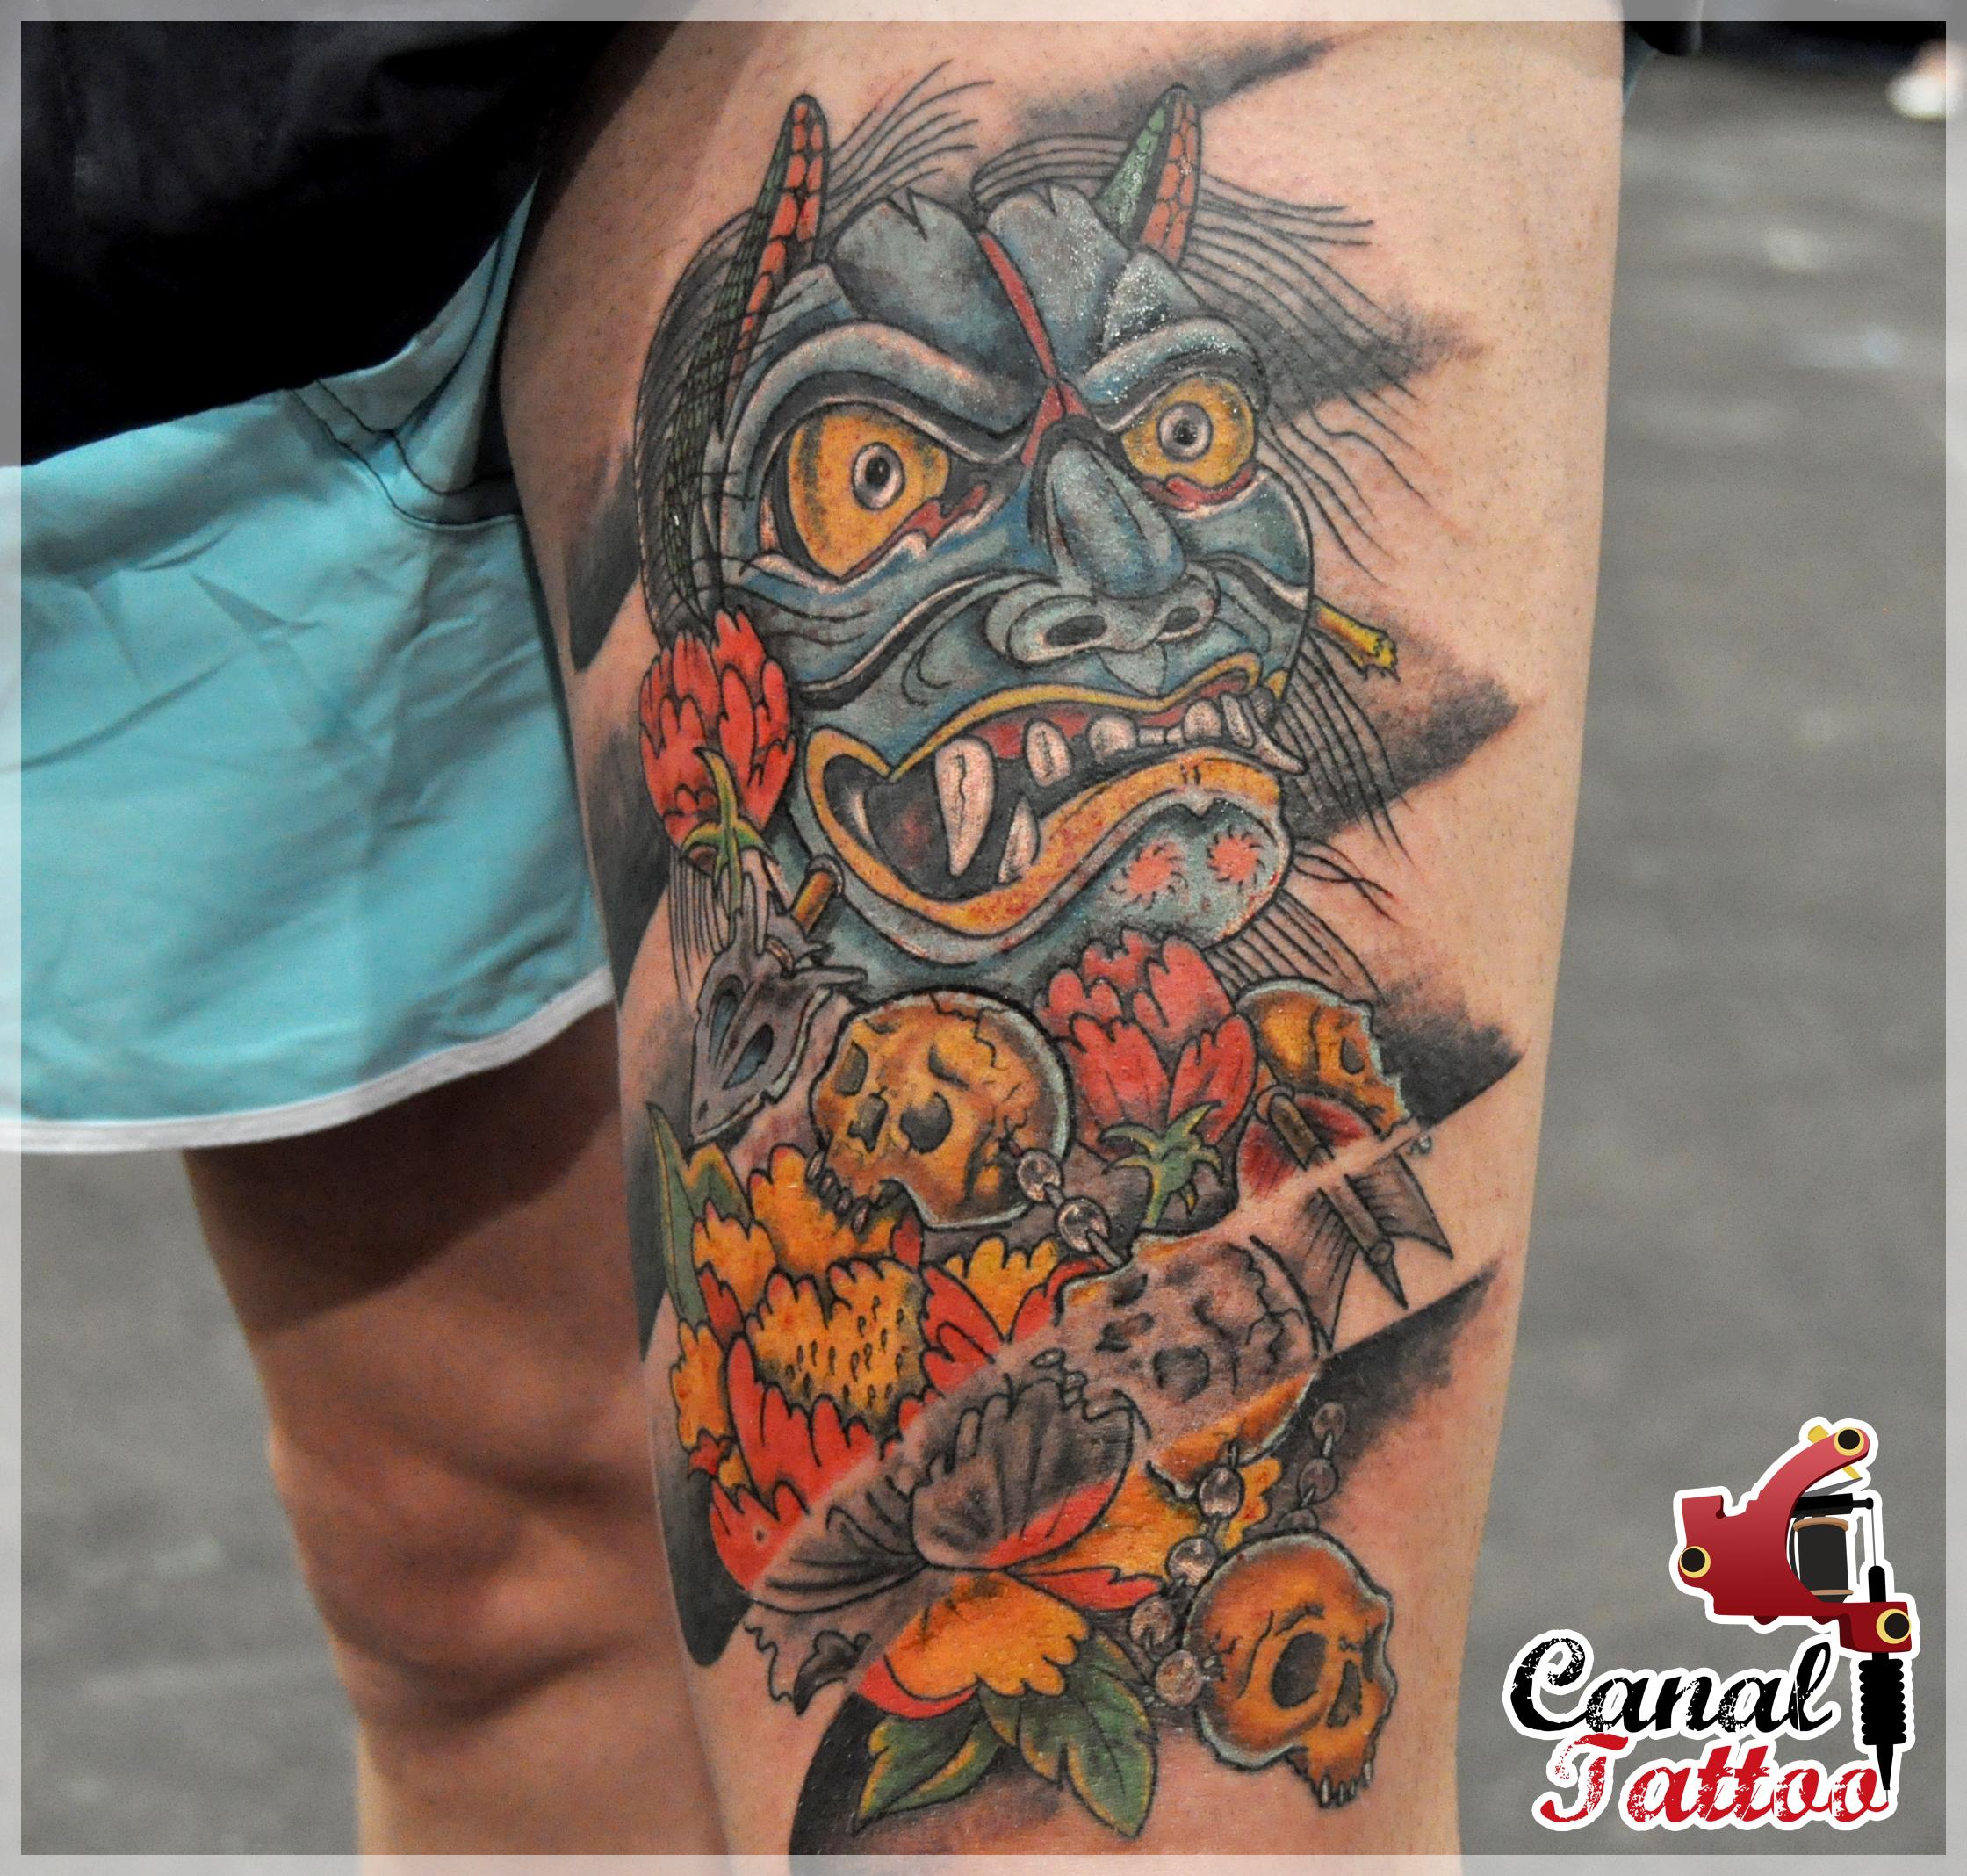 Los mejores tatuajes de mulafest 2014 gu a de tatuajes y for Los mejores tatuadores